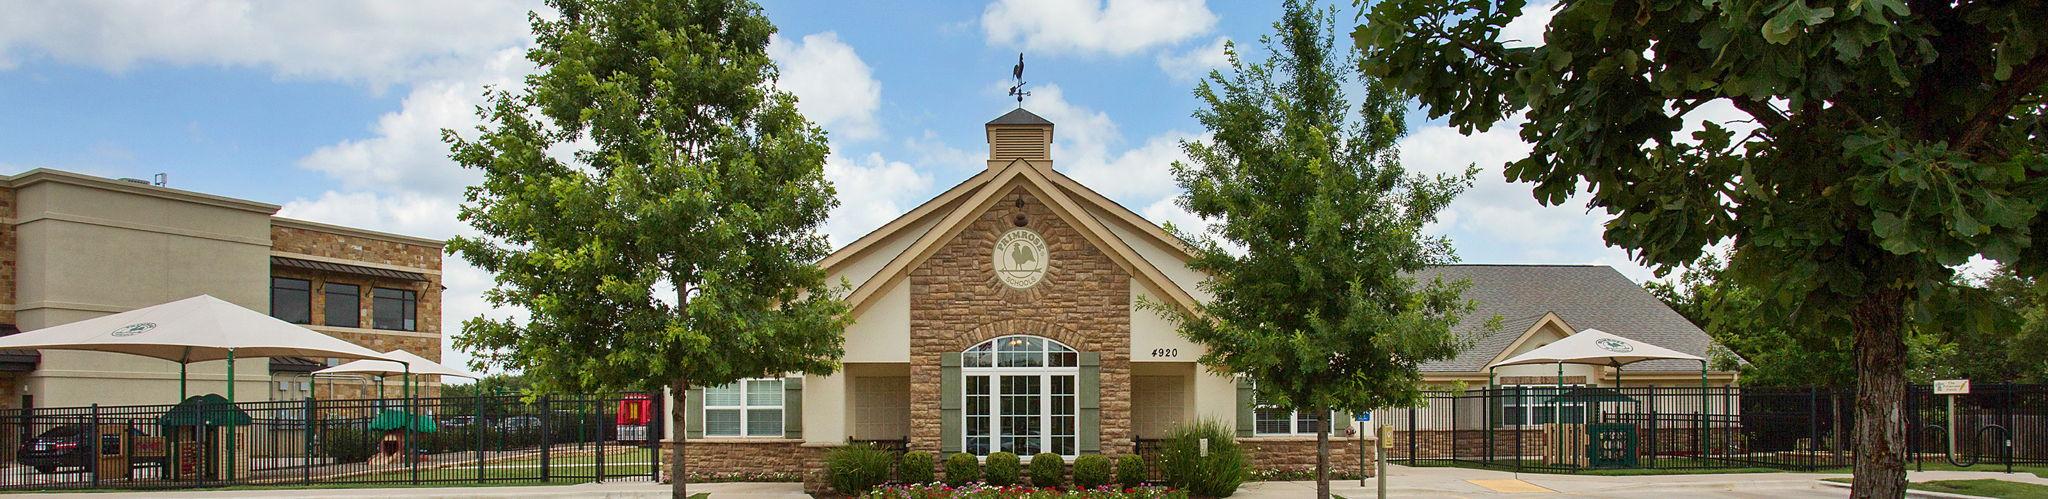 Exterior of a Primrose School of Southwest Austin